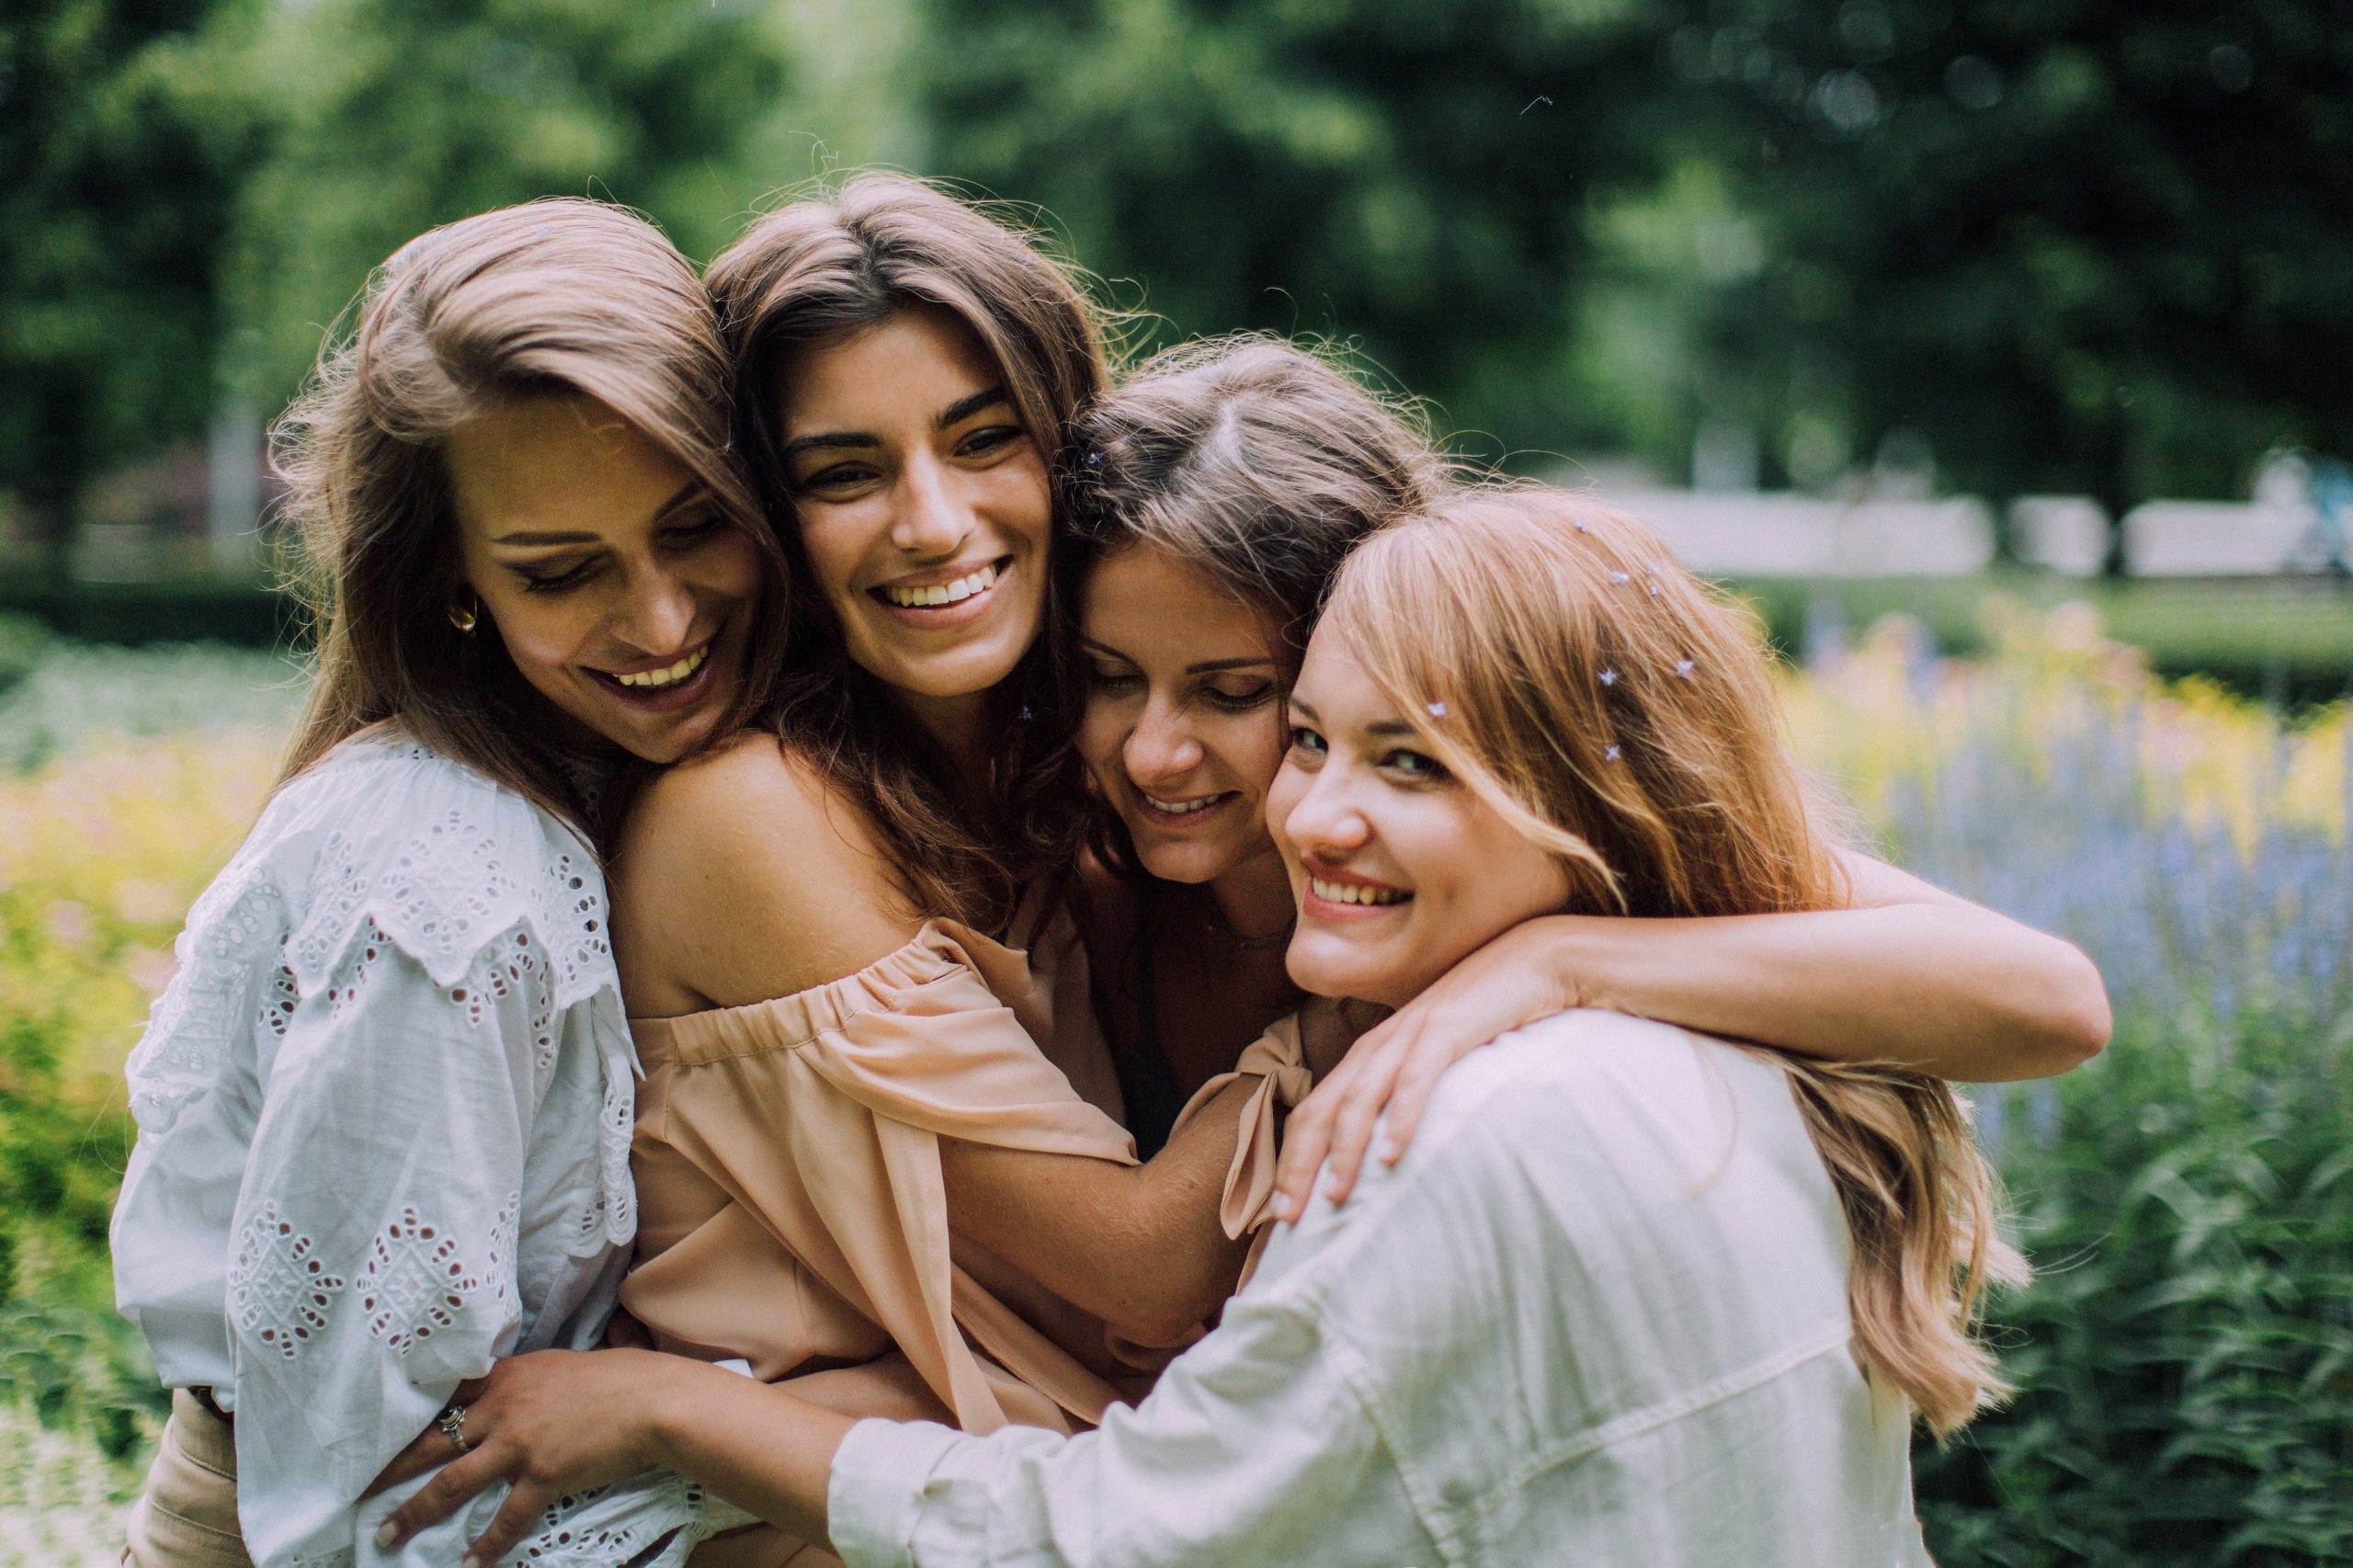 Women hugging and smiling